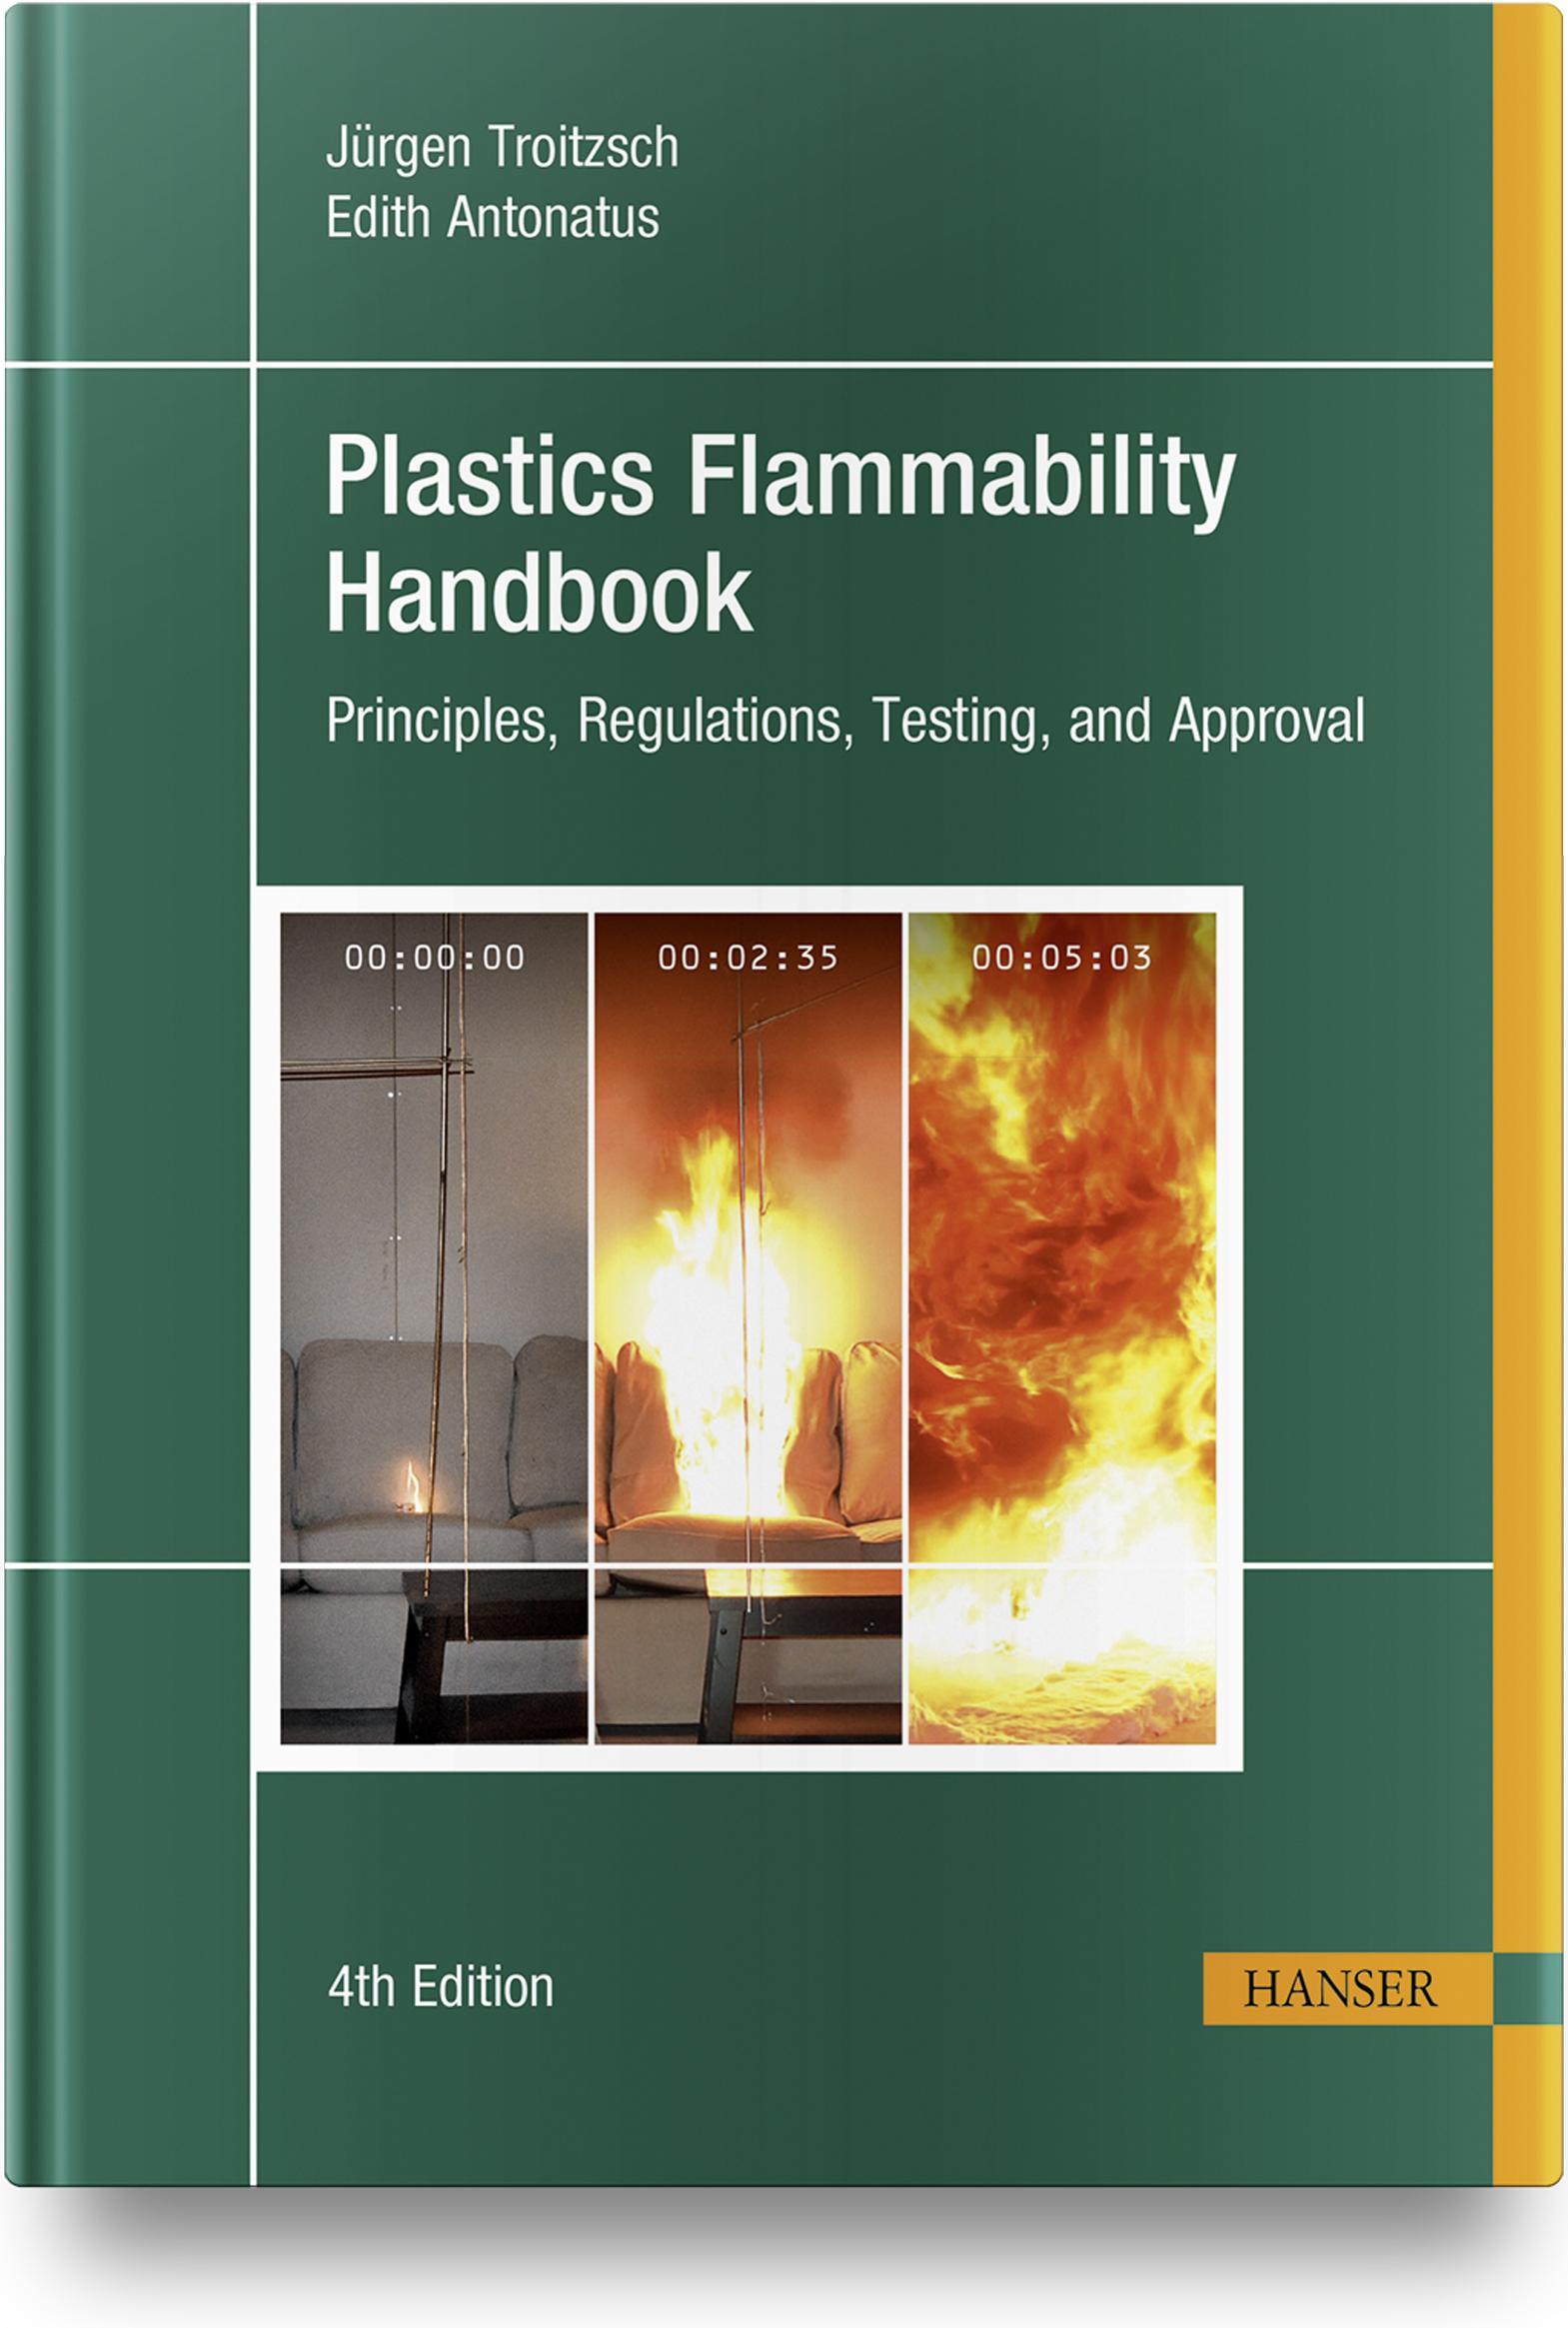 Plastics Flammability Handbook, 978-1-56990-762-7